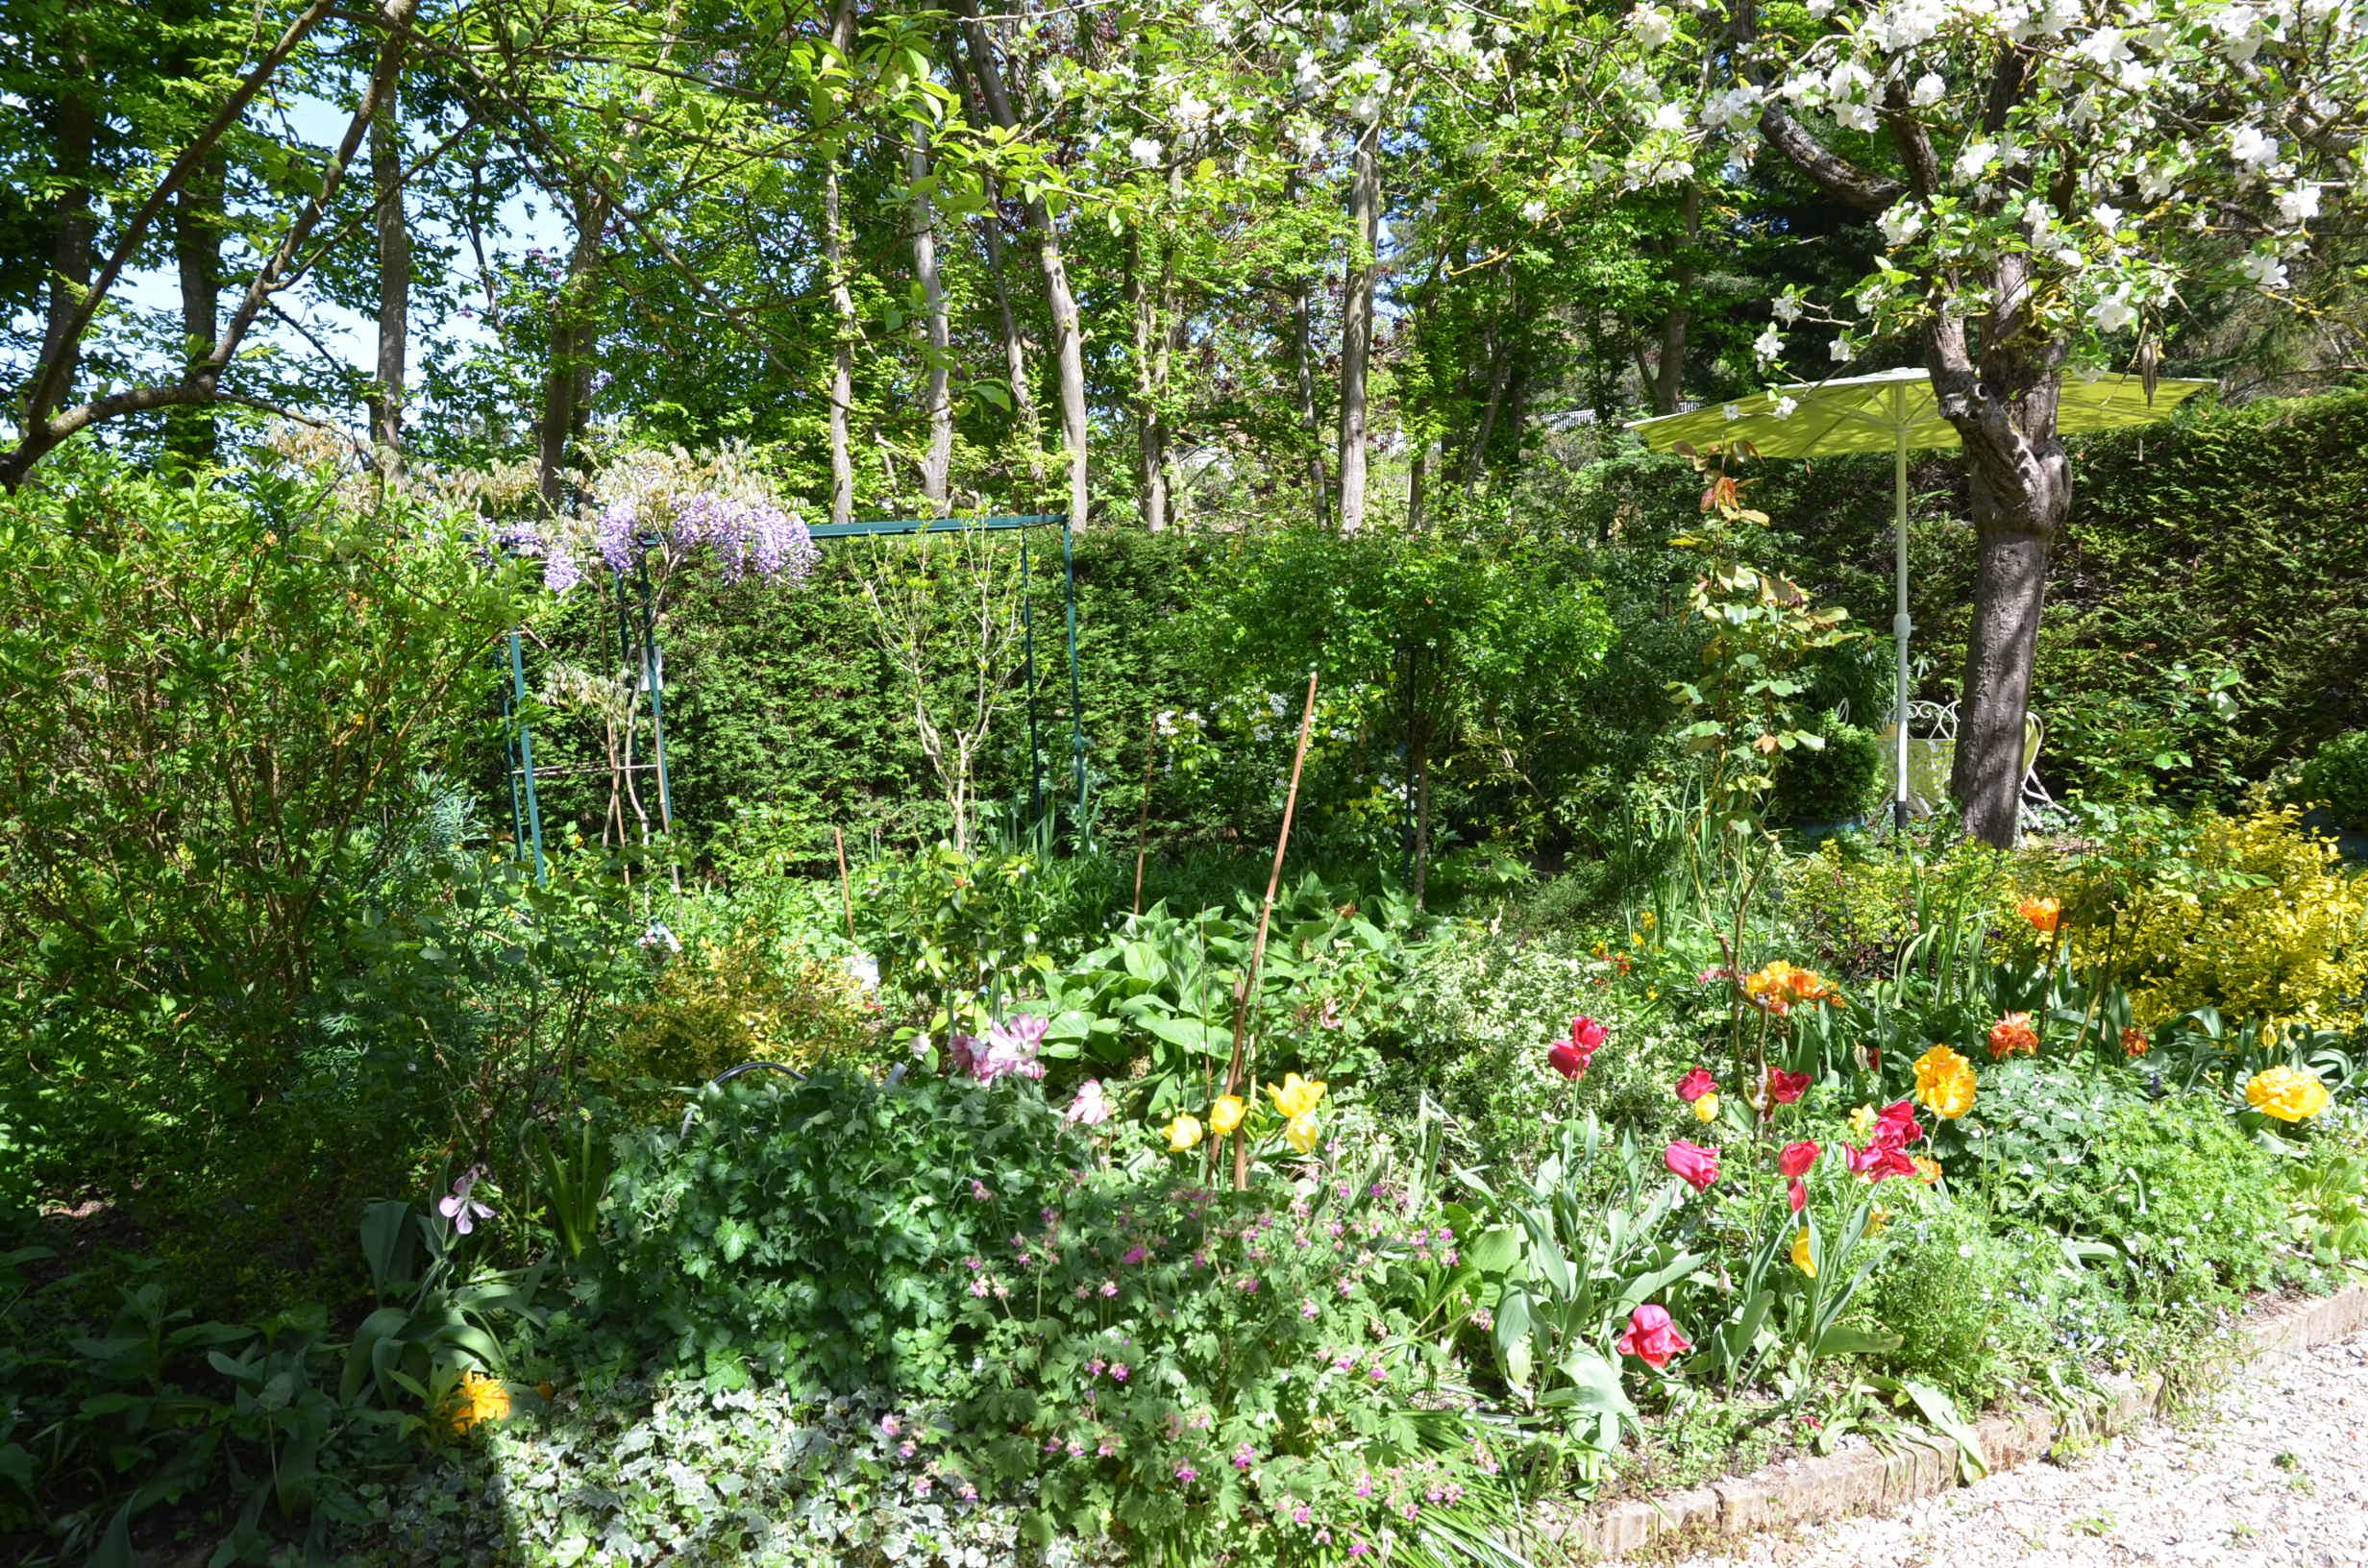 Maison d h tes giverny le clos fleuri b b giverny for Jardin fleuri maison